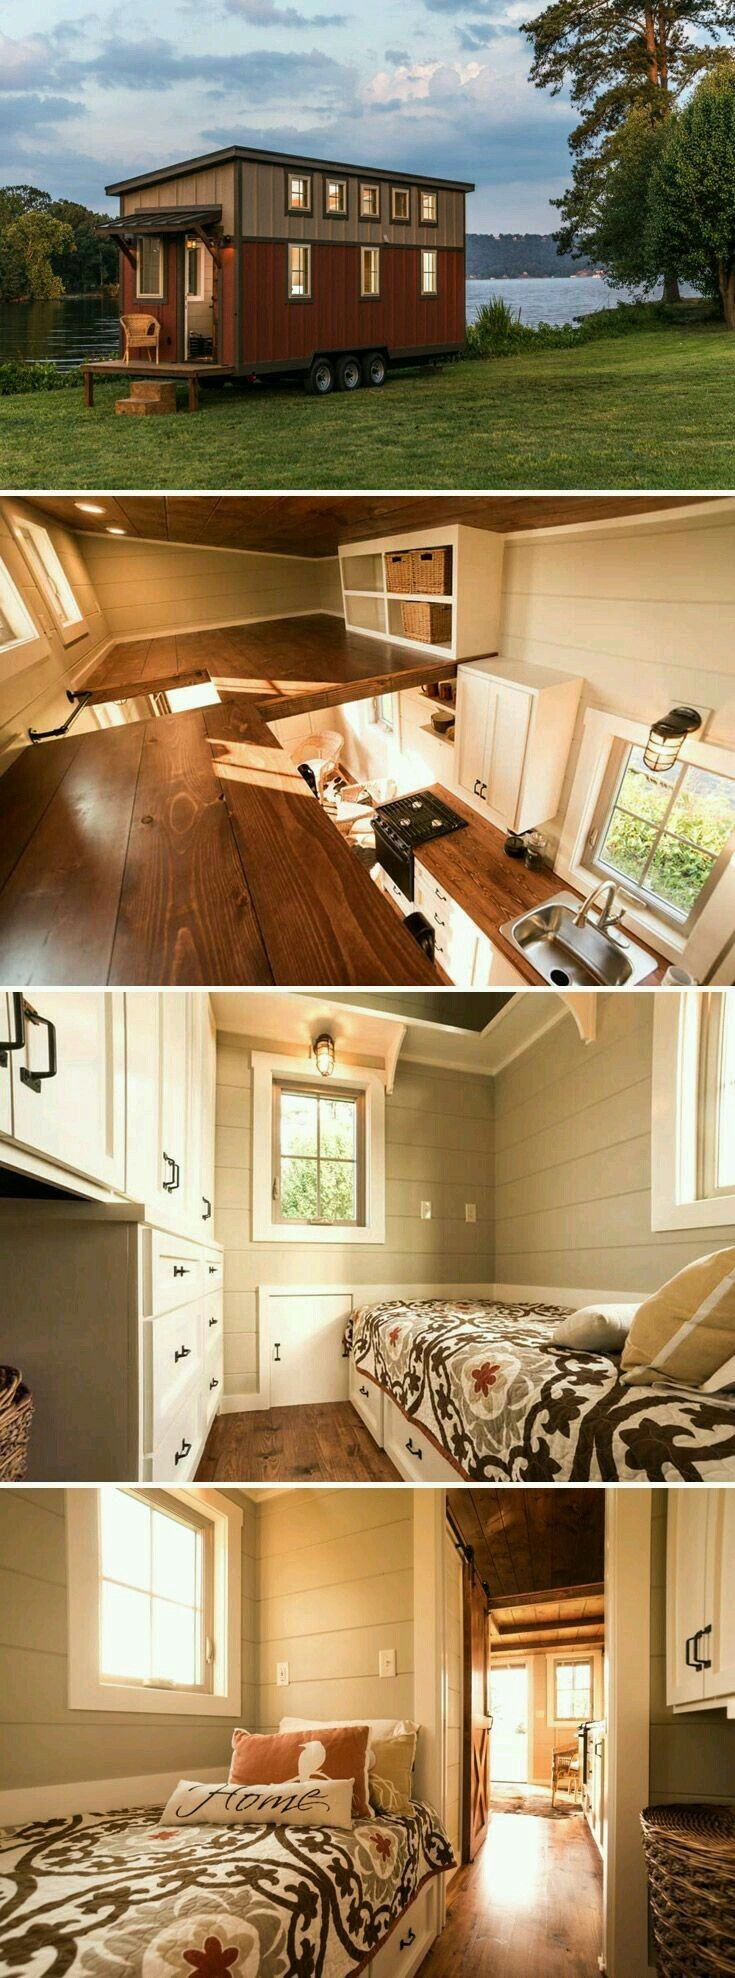 A 160 sq ft tiny house built on a triple axle trailer